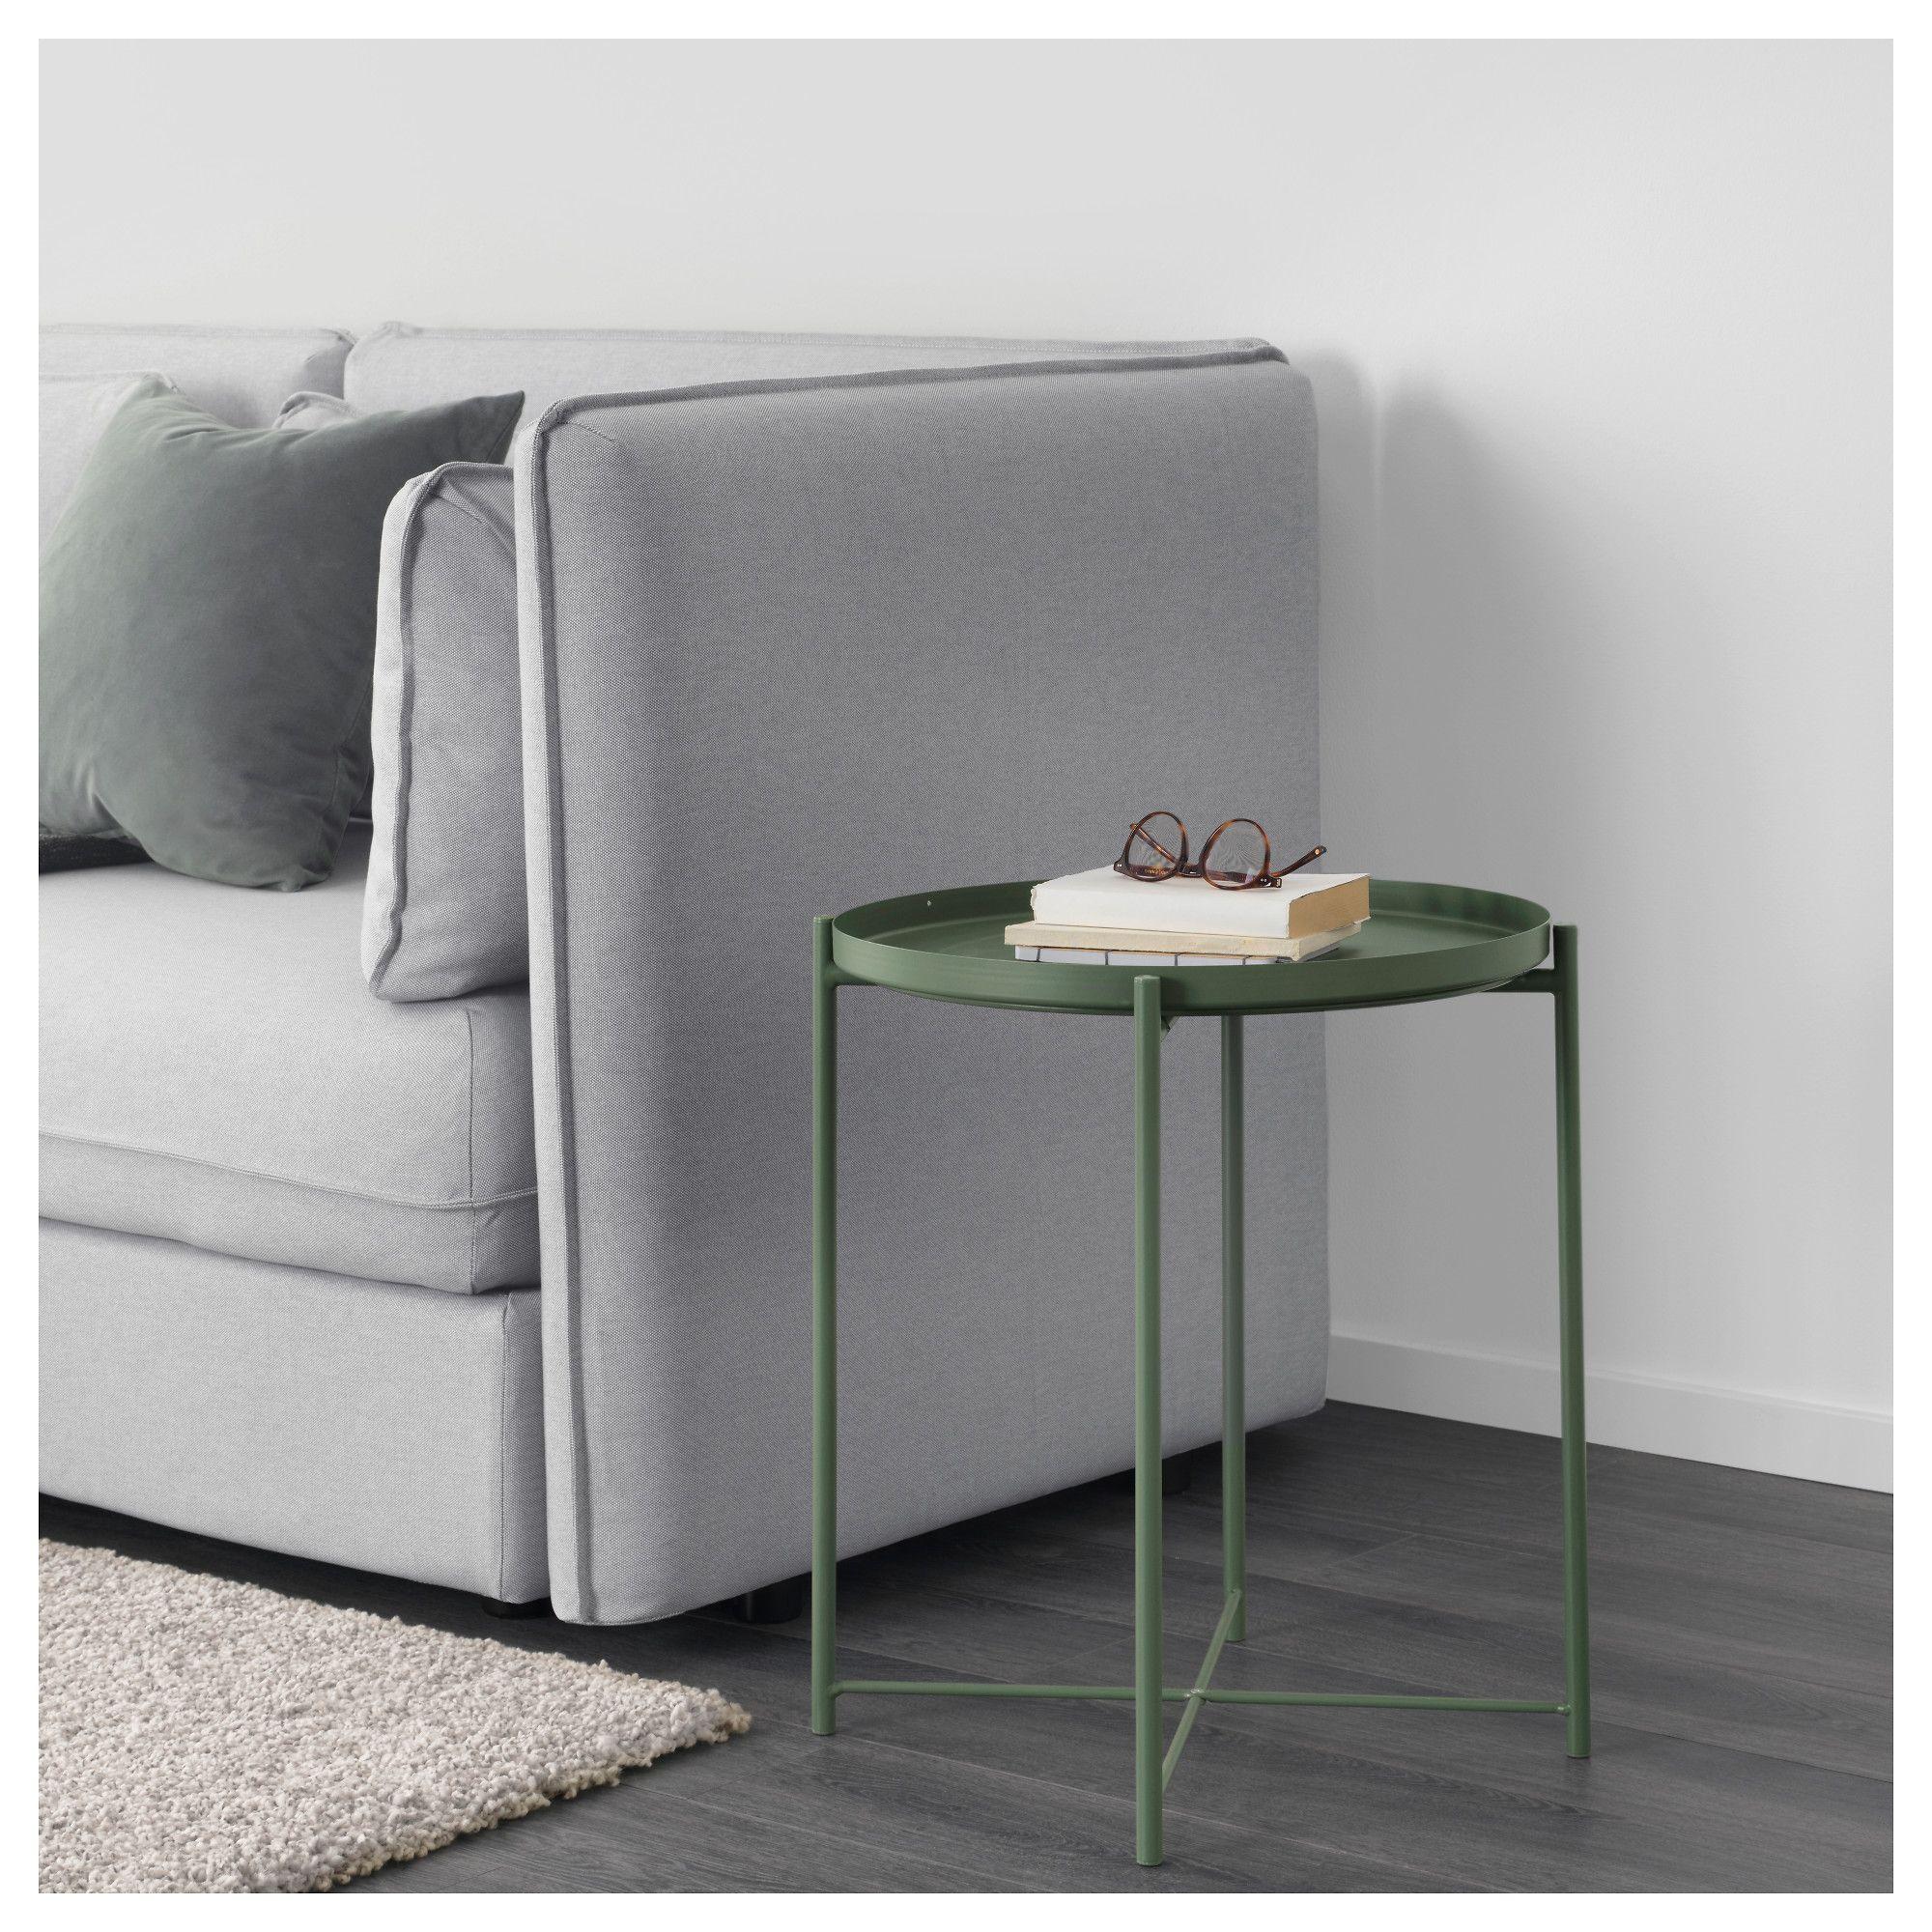 Furniture And Home Furnishings Home Decor Ikea Furniture